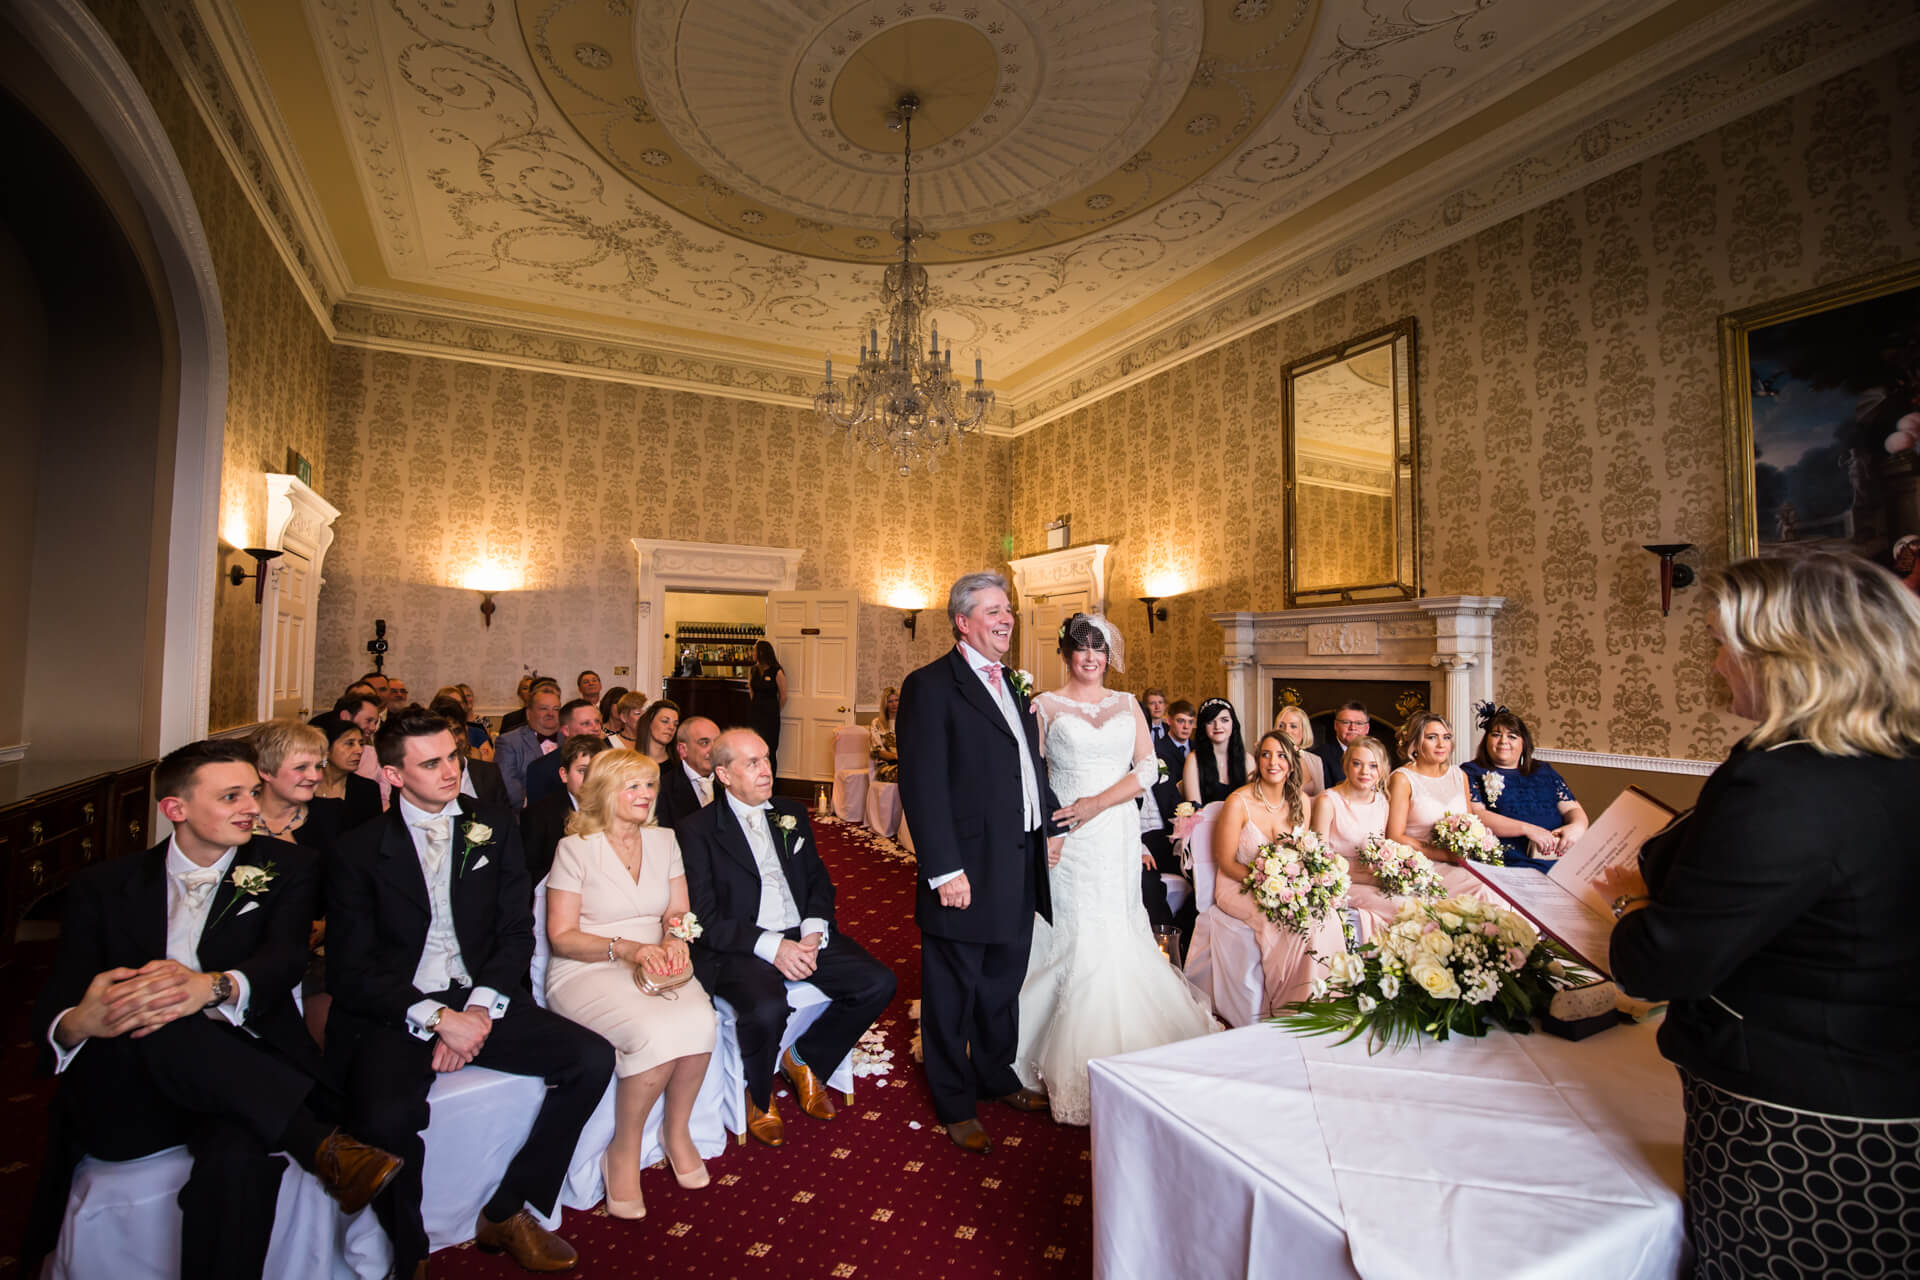 Wedding ceremony at Hazlewood Castle